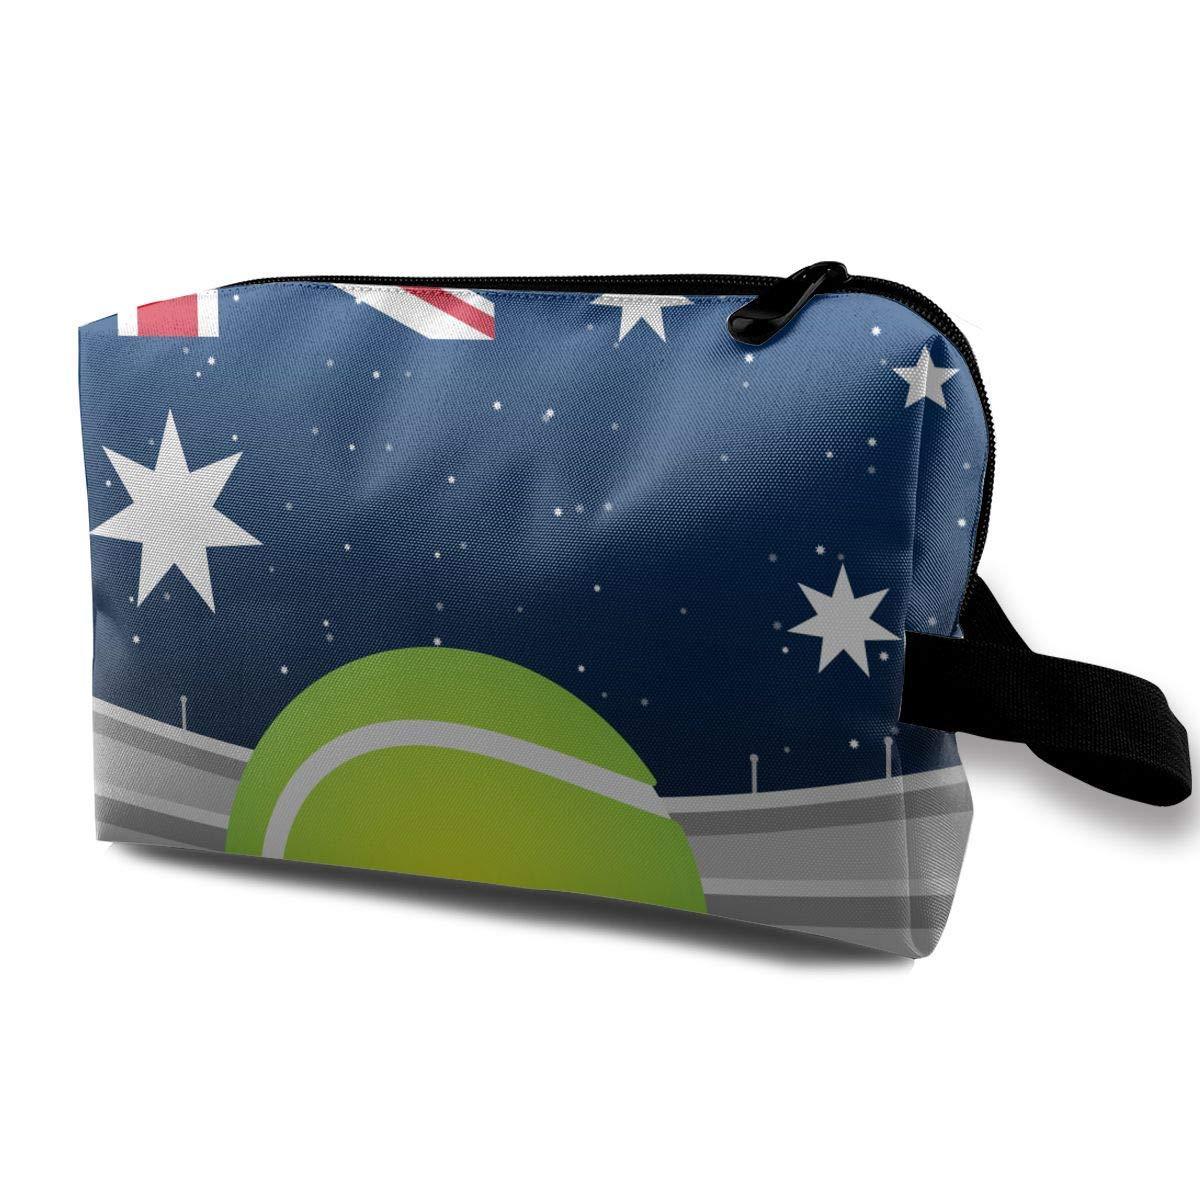 British Flag Tennis Court Small Travel Toiletry Bag Super Light Toiletry Organizer for Overnight Trip Bag